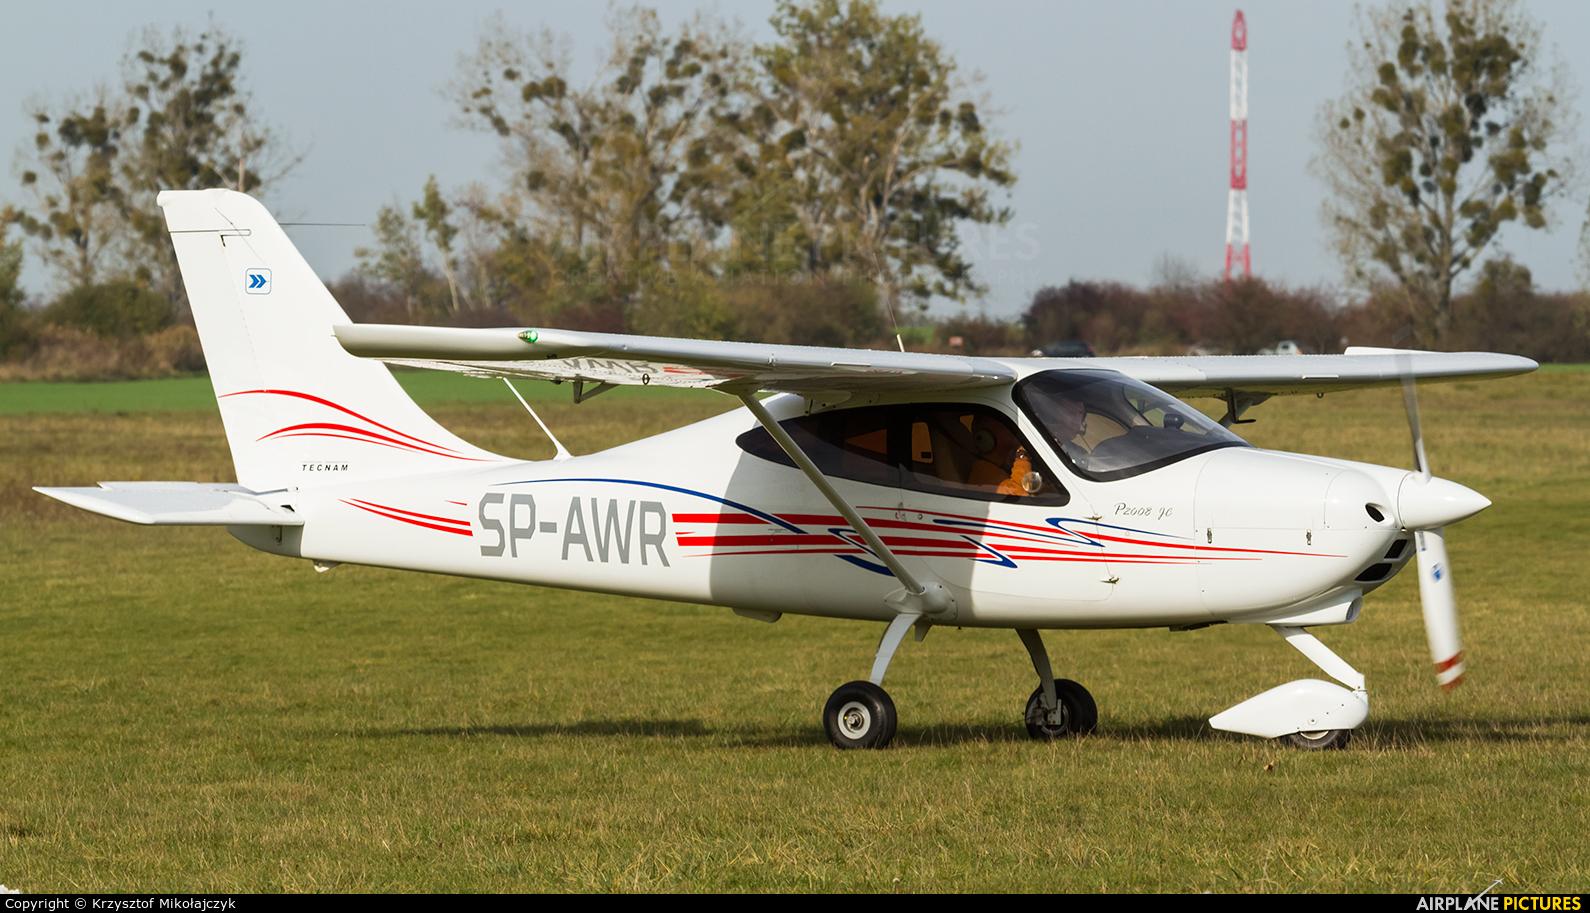 Aeroklub Wroclawski SP-AWR aircraft at Wrocław - Szymanów